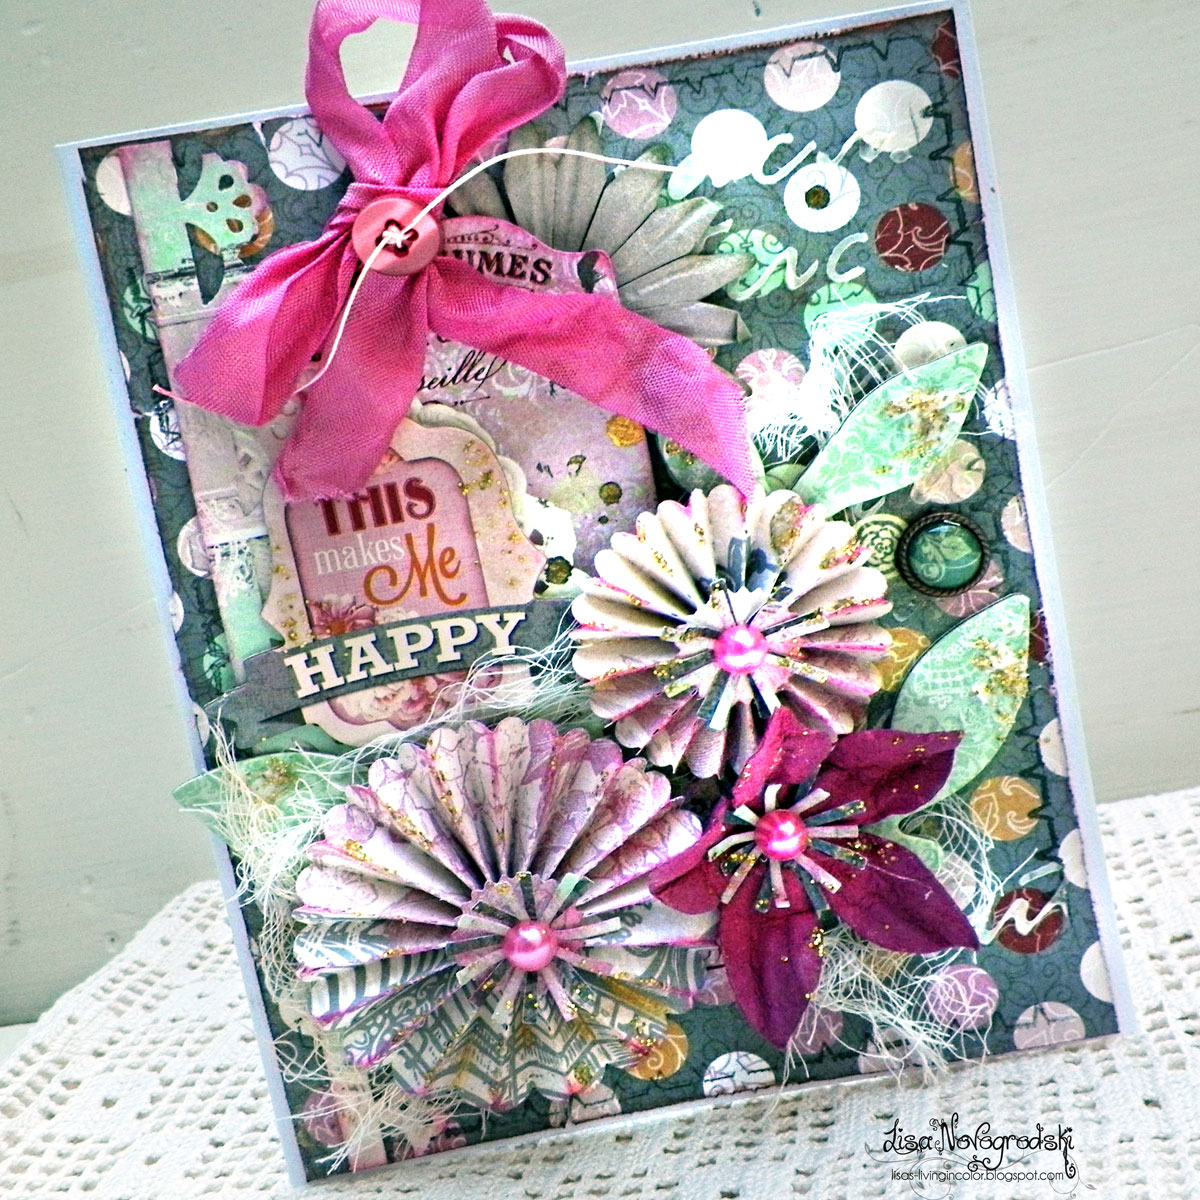 This_Makes_Me_Happy_Card_Lisa_Novogrodski_Bo_Bunny_Madeleine_01